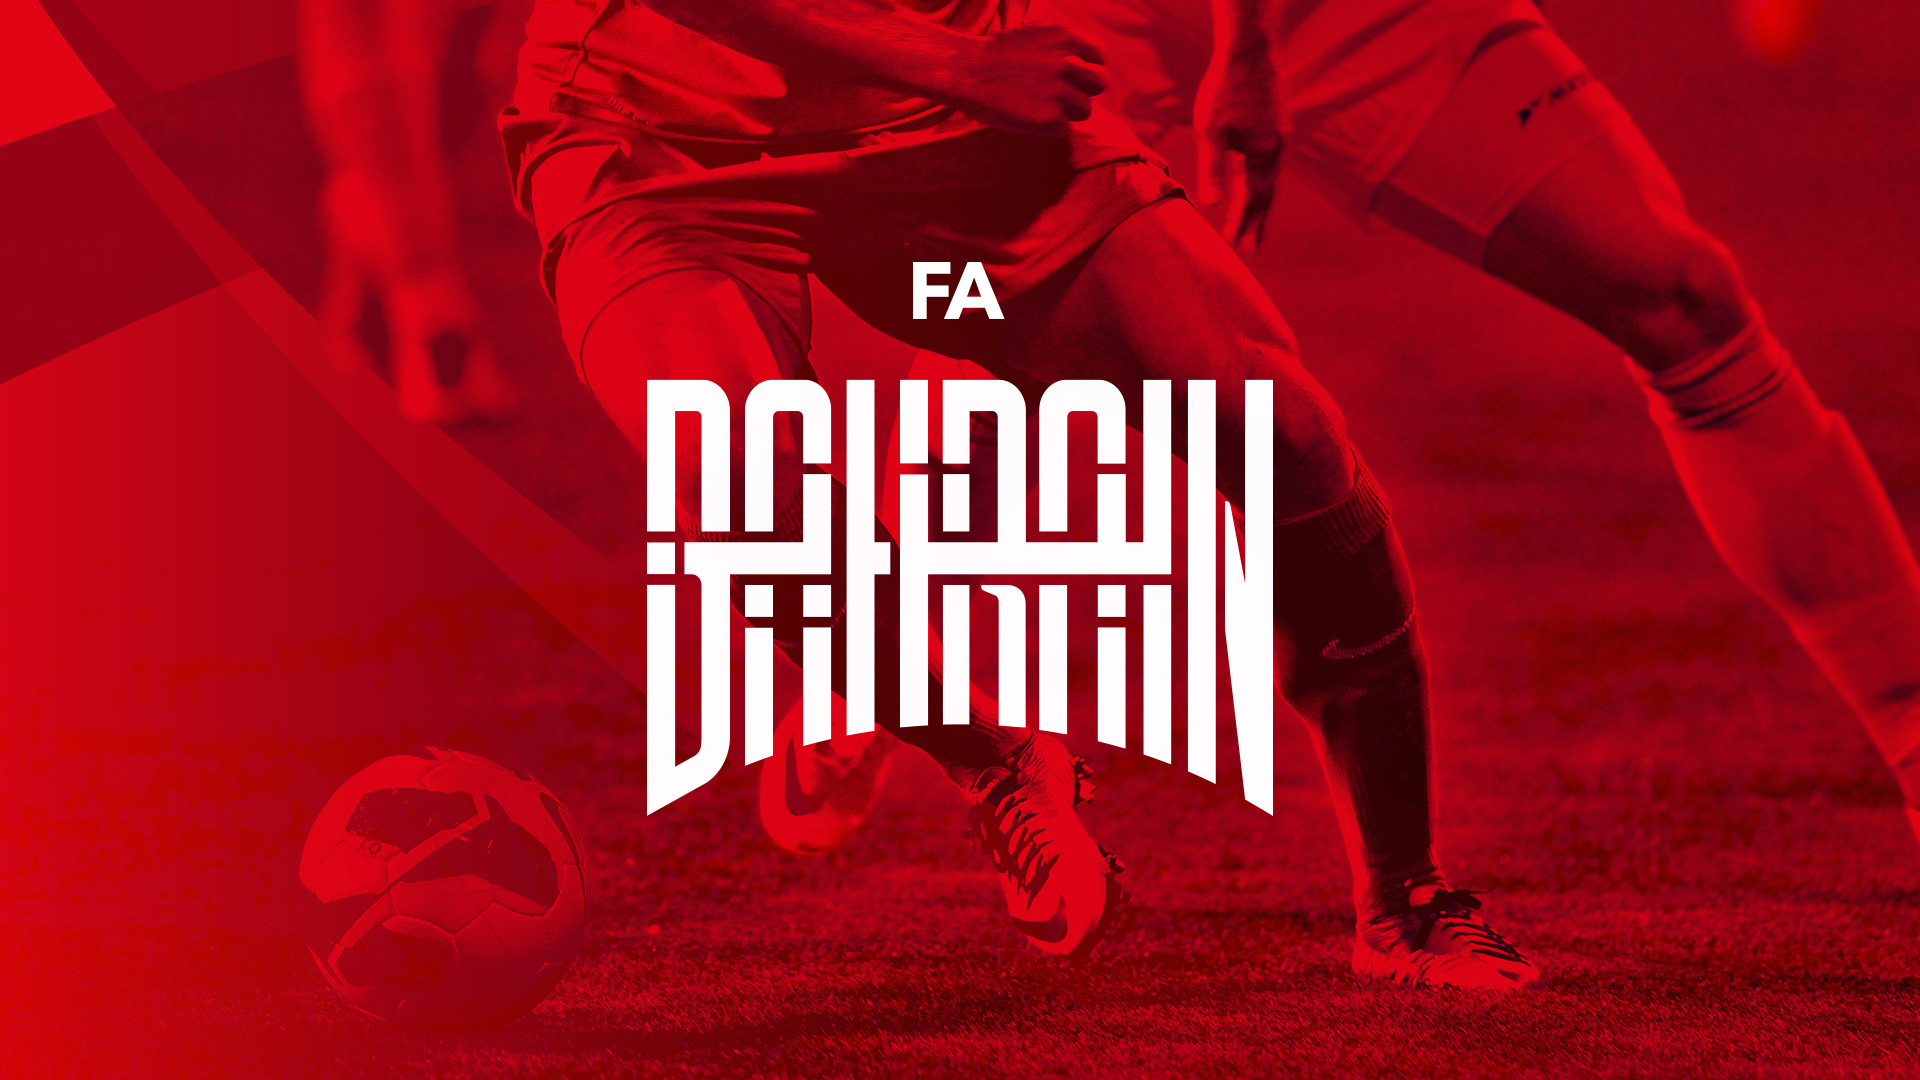 bahrain football association branding